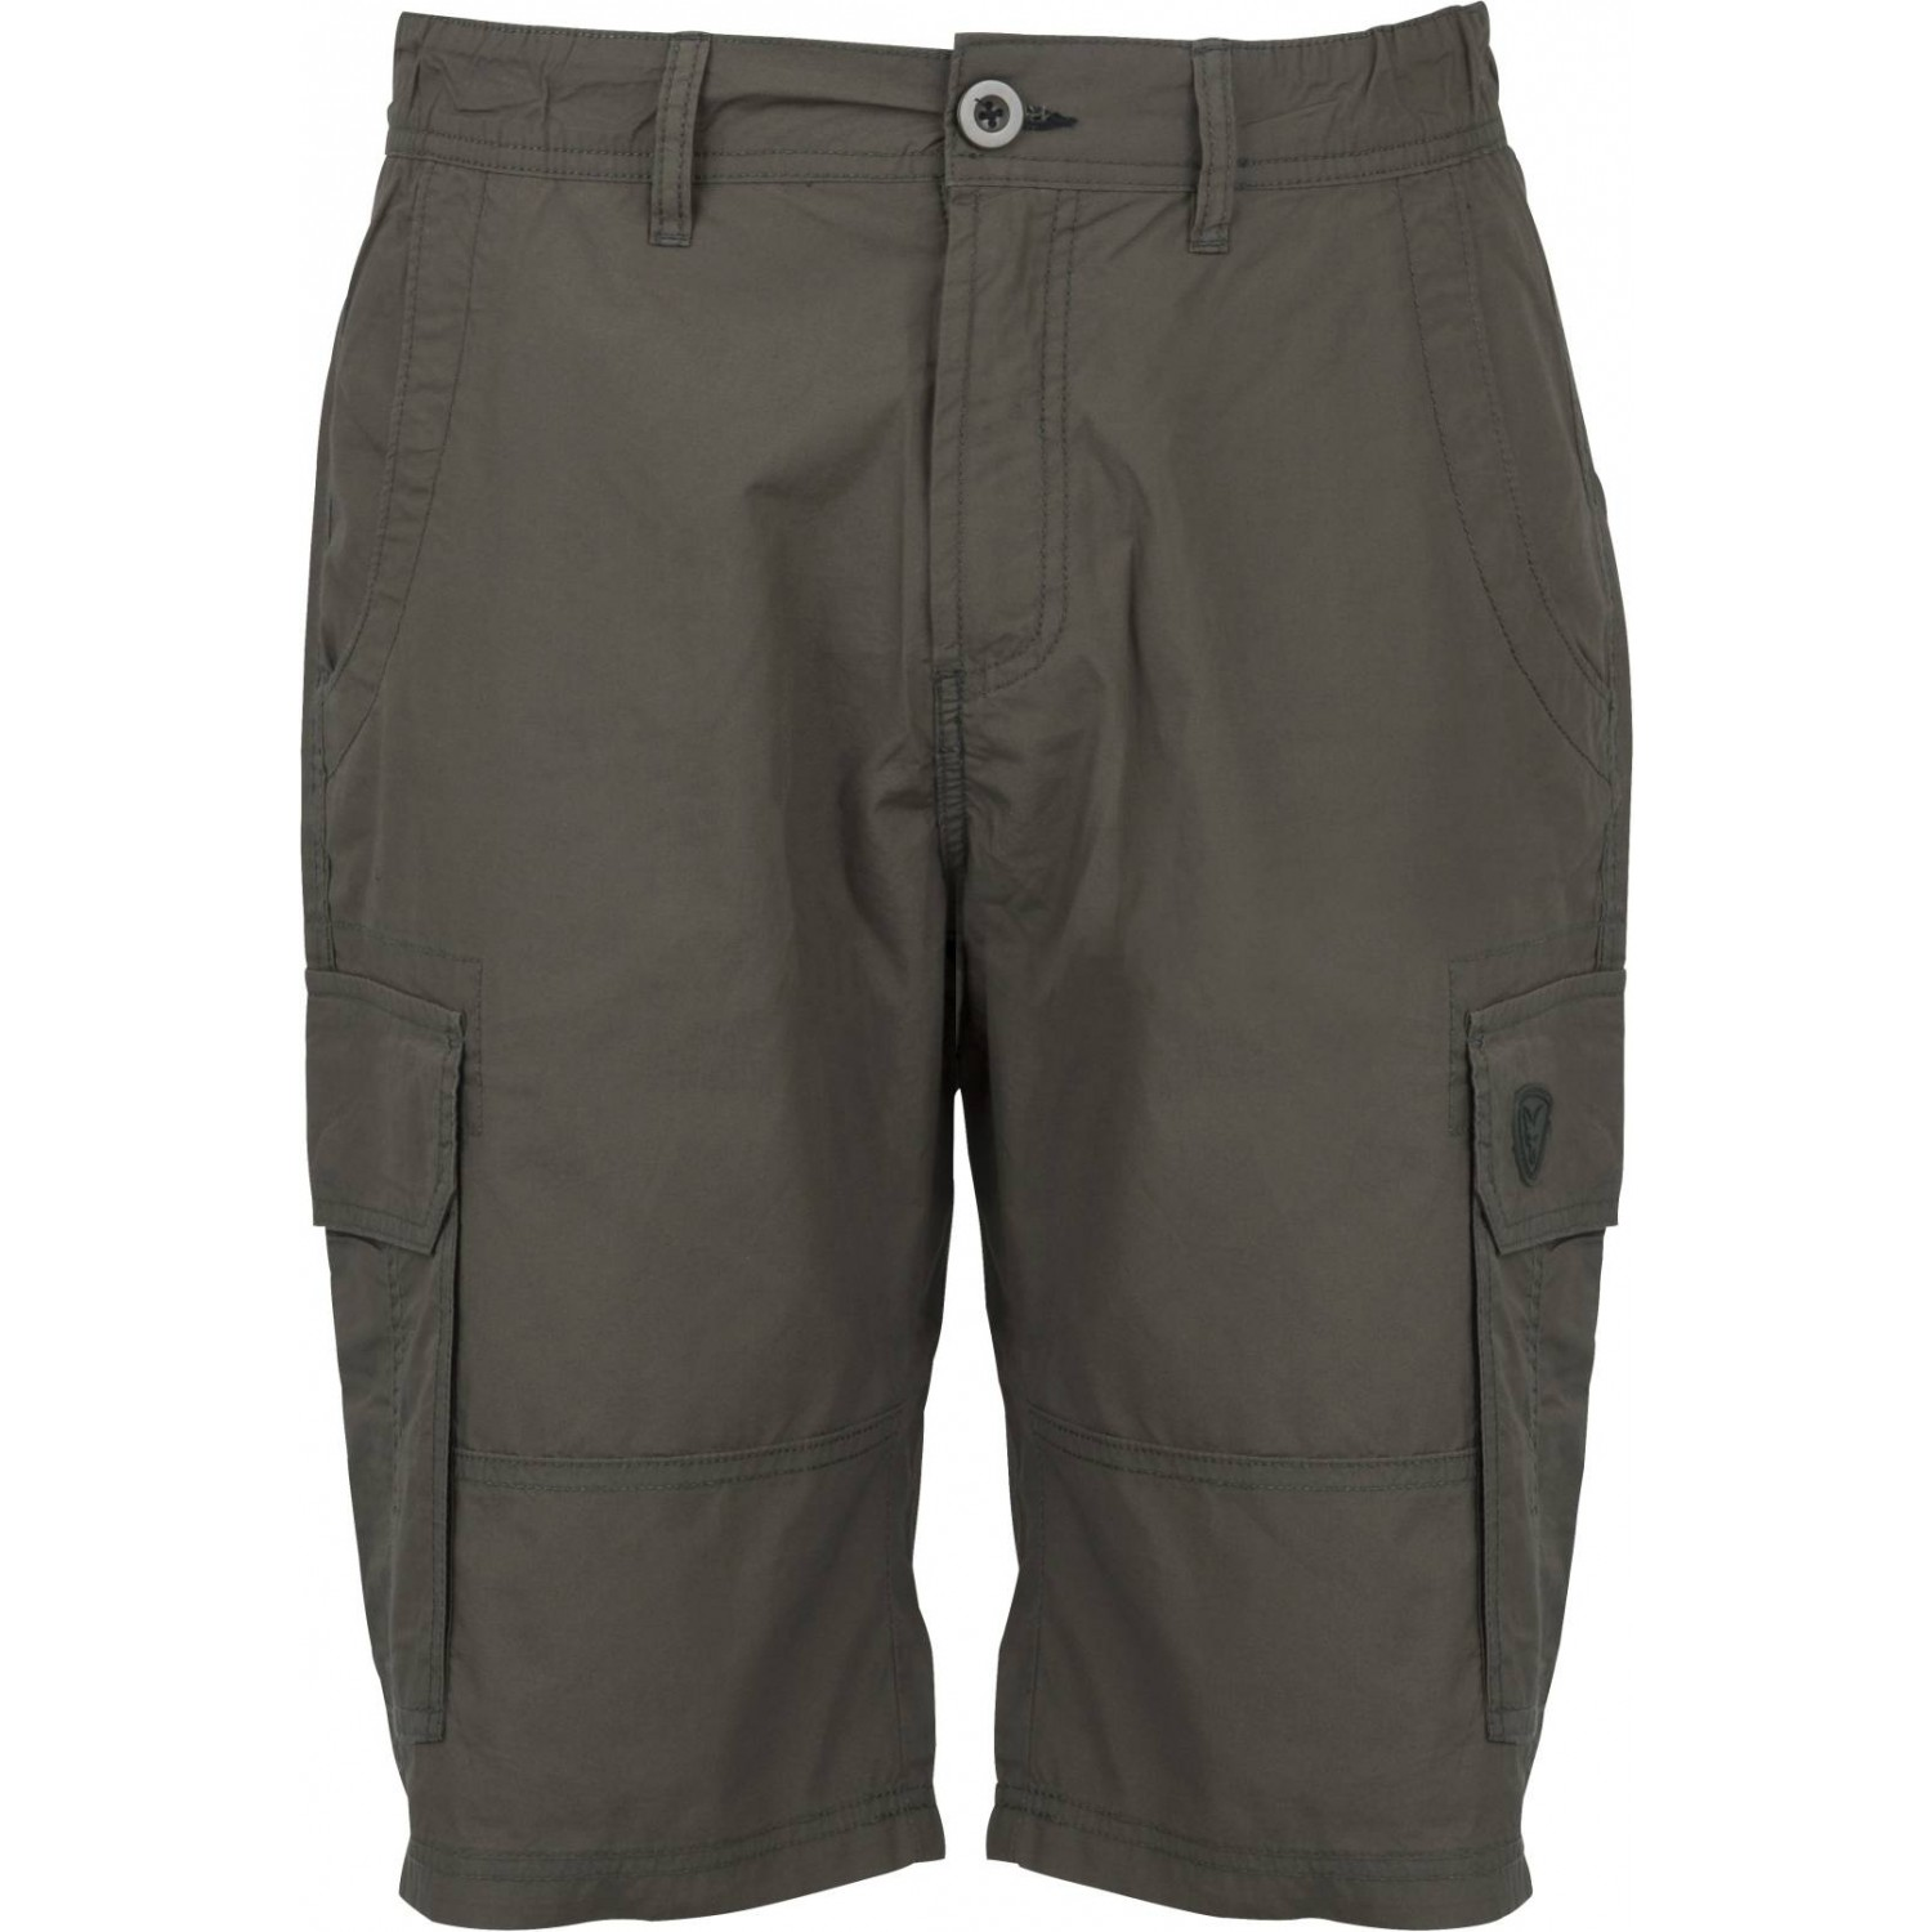 XXXL Fox CHUNK lightweight Cargo Shorts Camo Shorts Angelbekleidung Gr